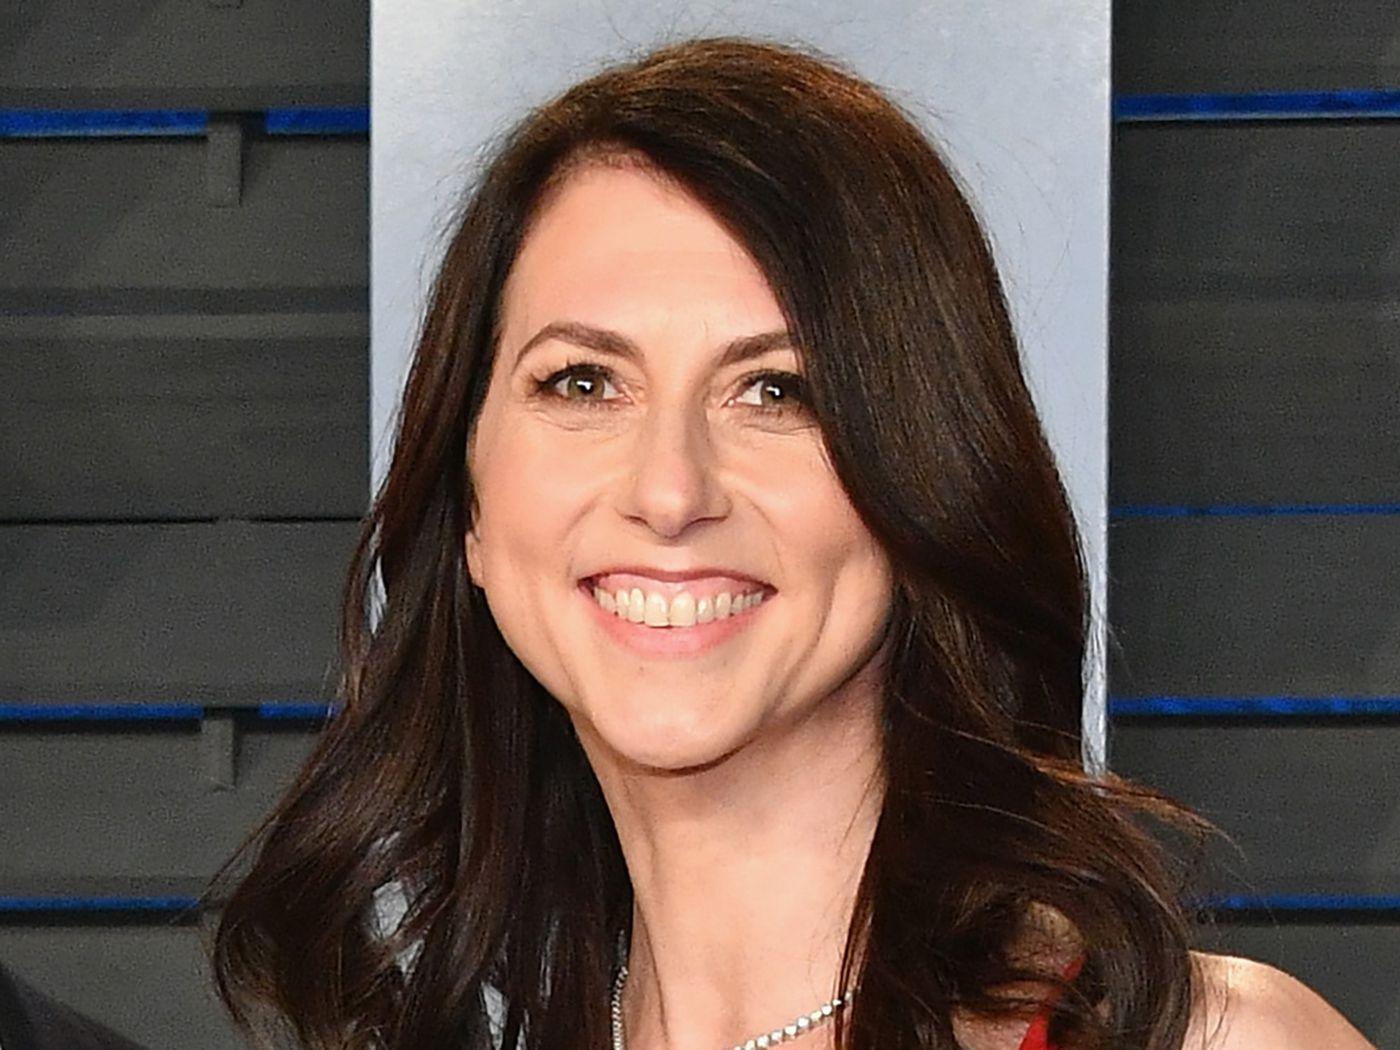 Jeff Bezos' ex-wife, MacKenzie Scott gives away another $2.7 Billion to charity